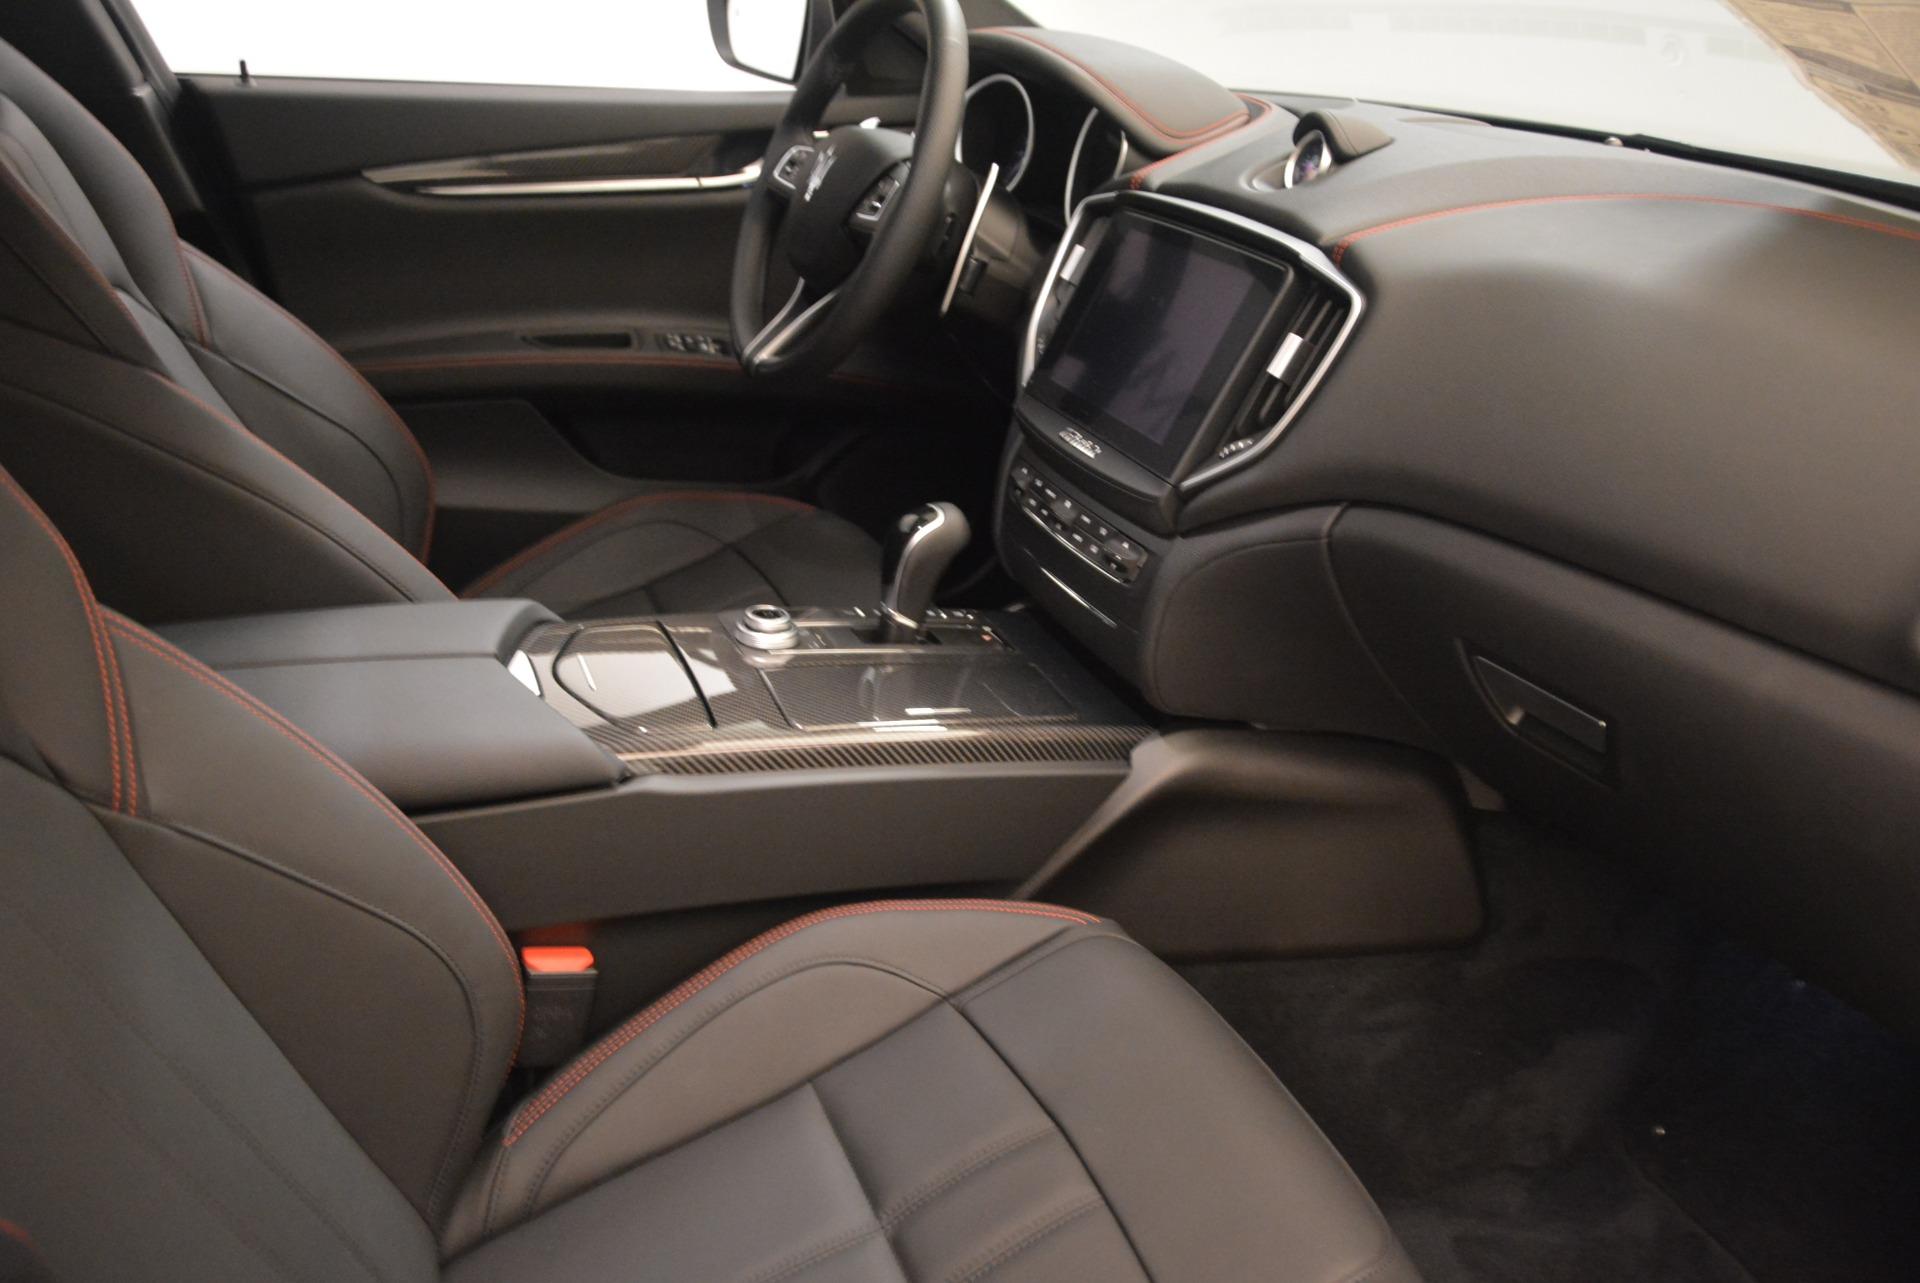 New 2018 Maserati Ghibli SQ4 GranSport Nerissimo For Sale In Westport, CT 2278_p16